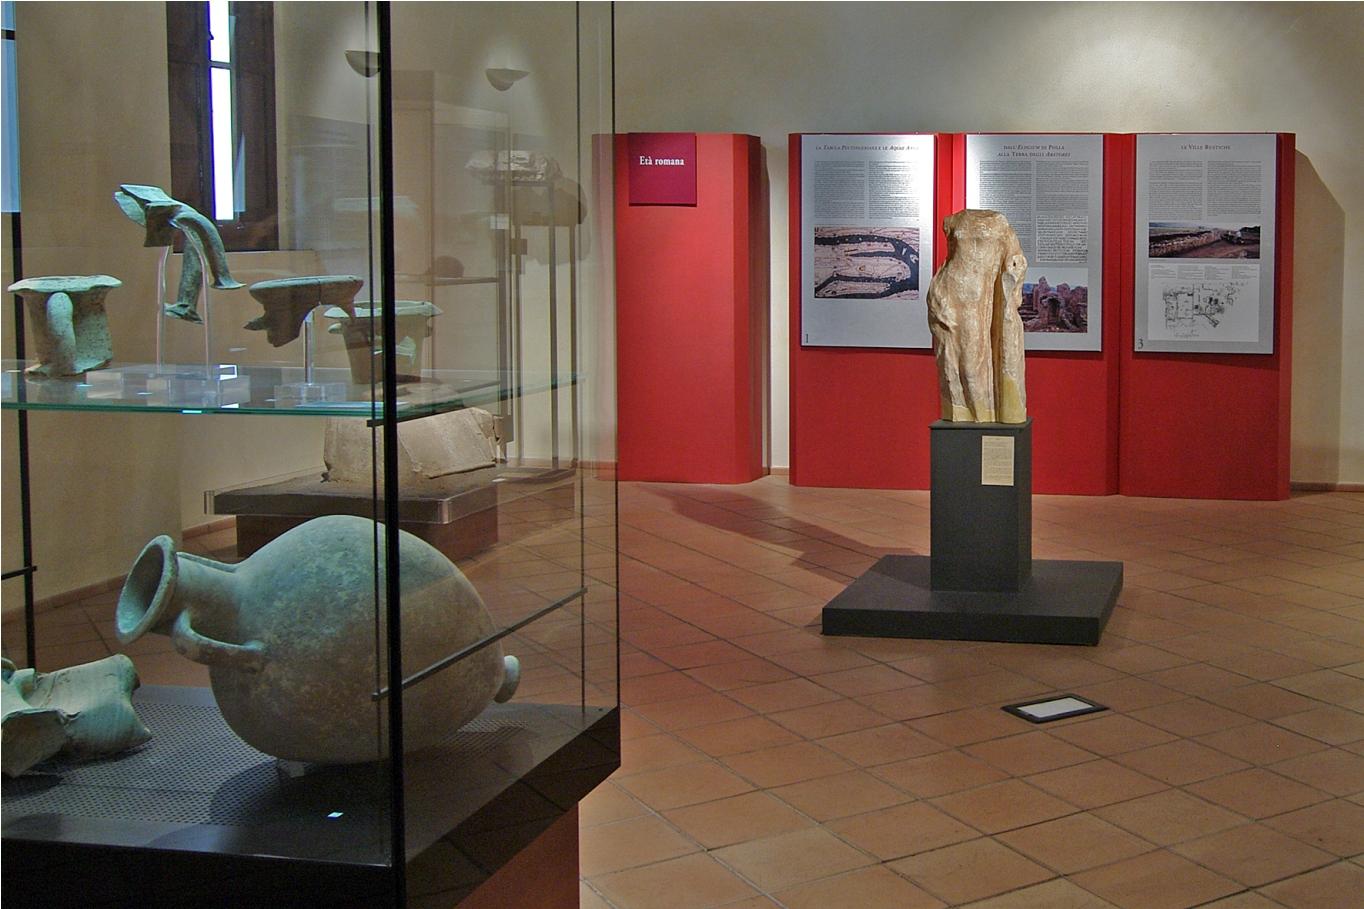 lametia_Museo archeologico lametino_sale-espositive2_foto-pm-cal